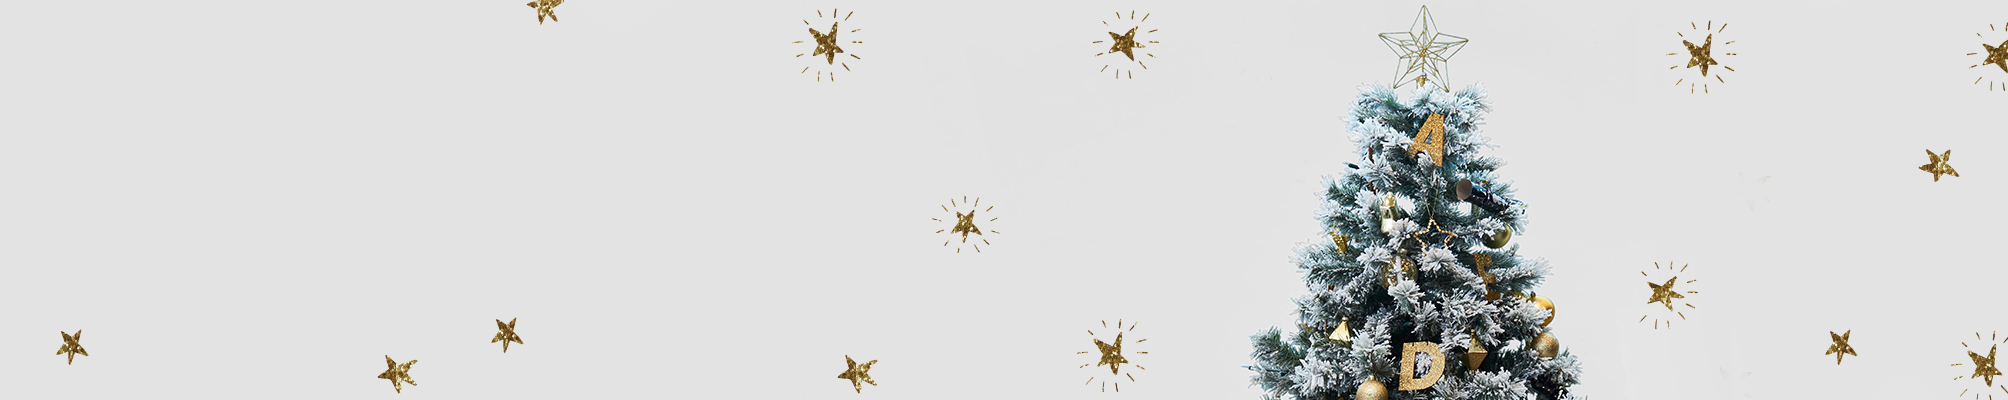 kerstslingers - Herobanner - HEMA